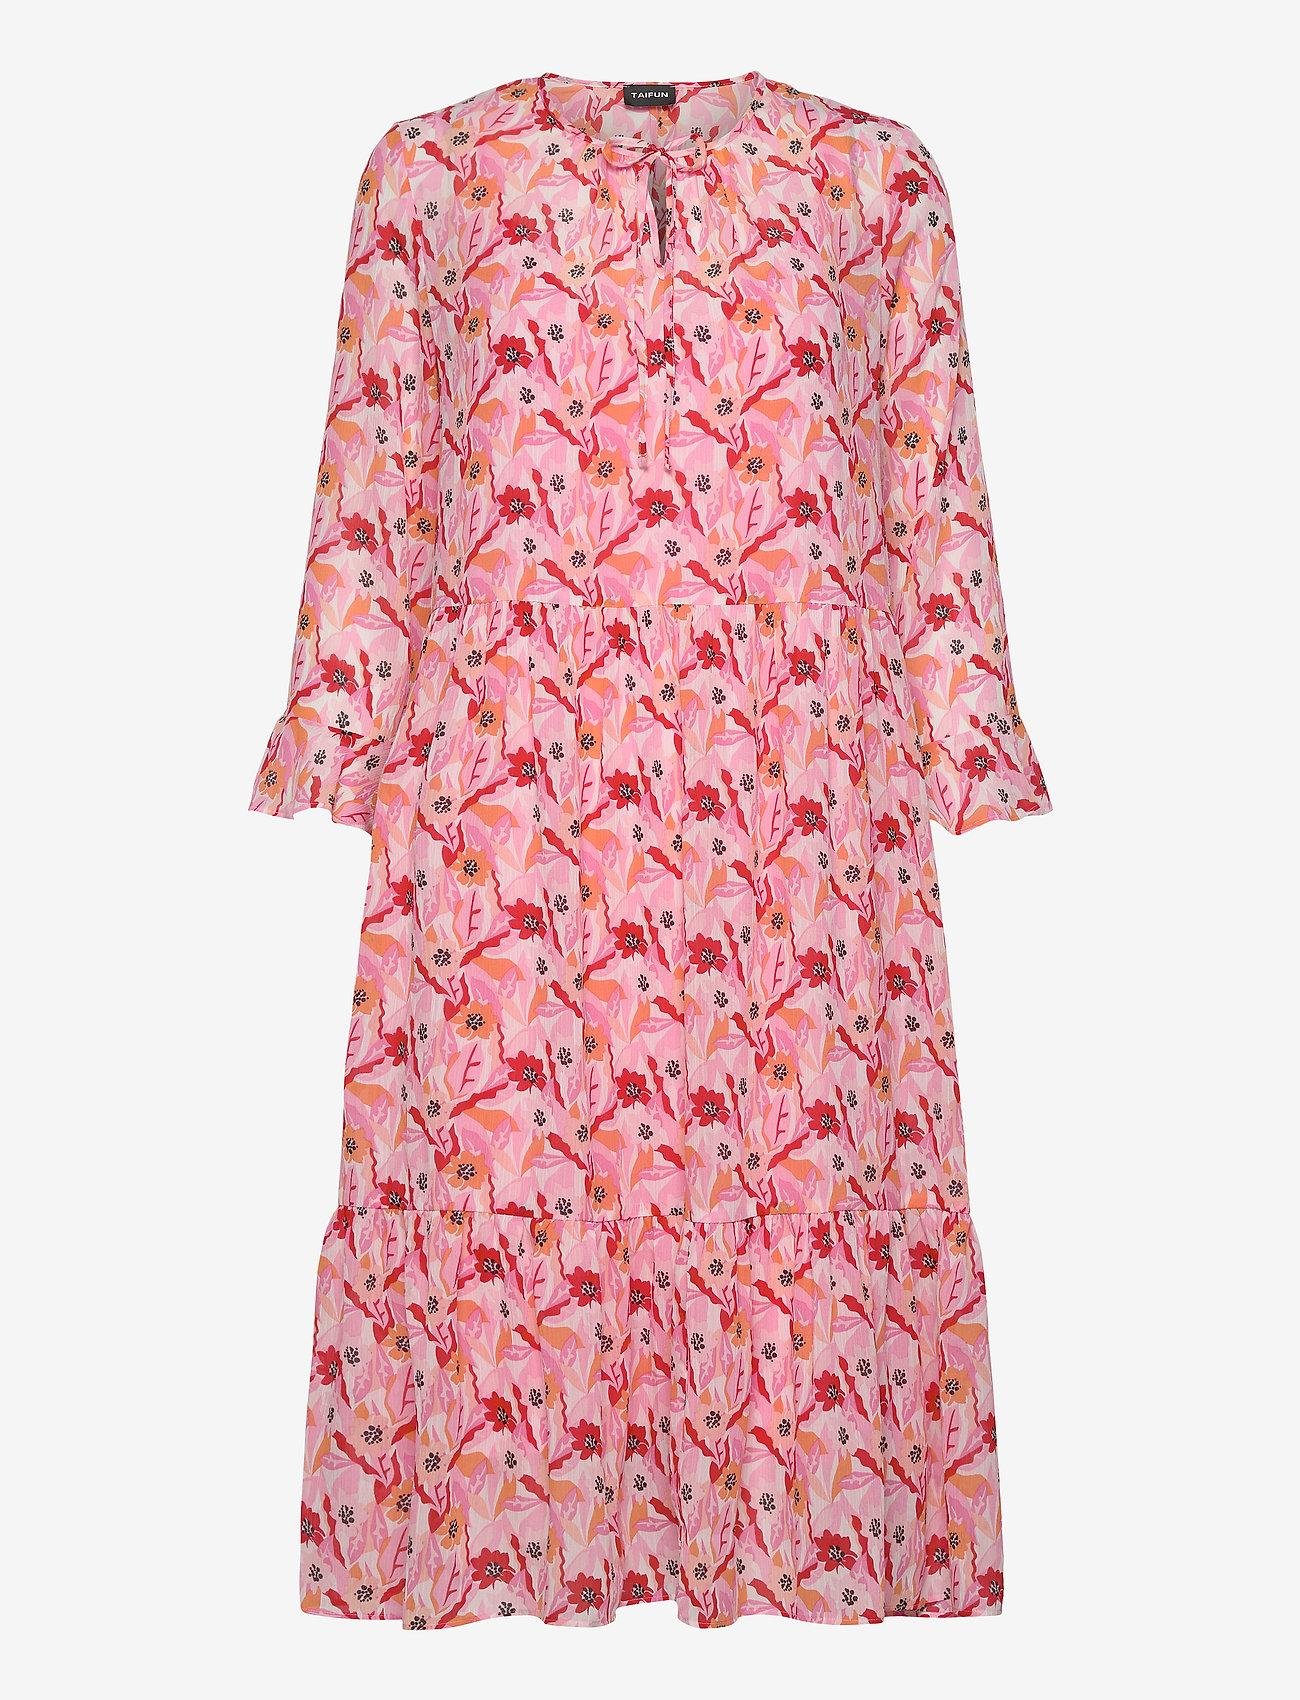 Taifun - DRESS WOVEN FABRIC - midiklänningar - pink sugar patterned - 0